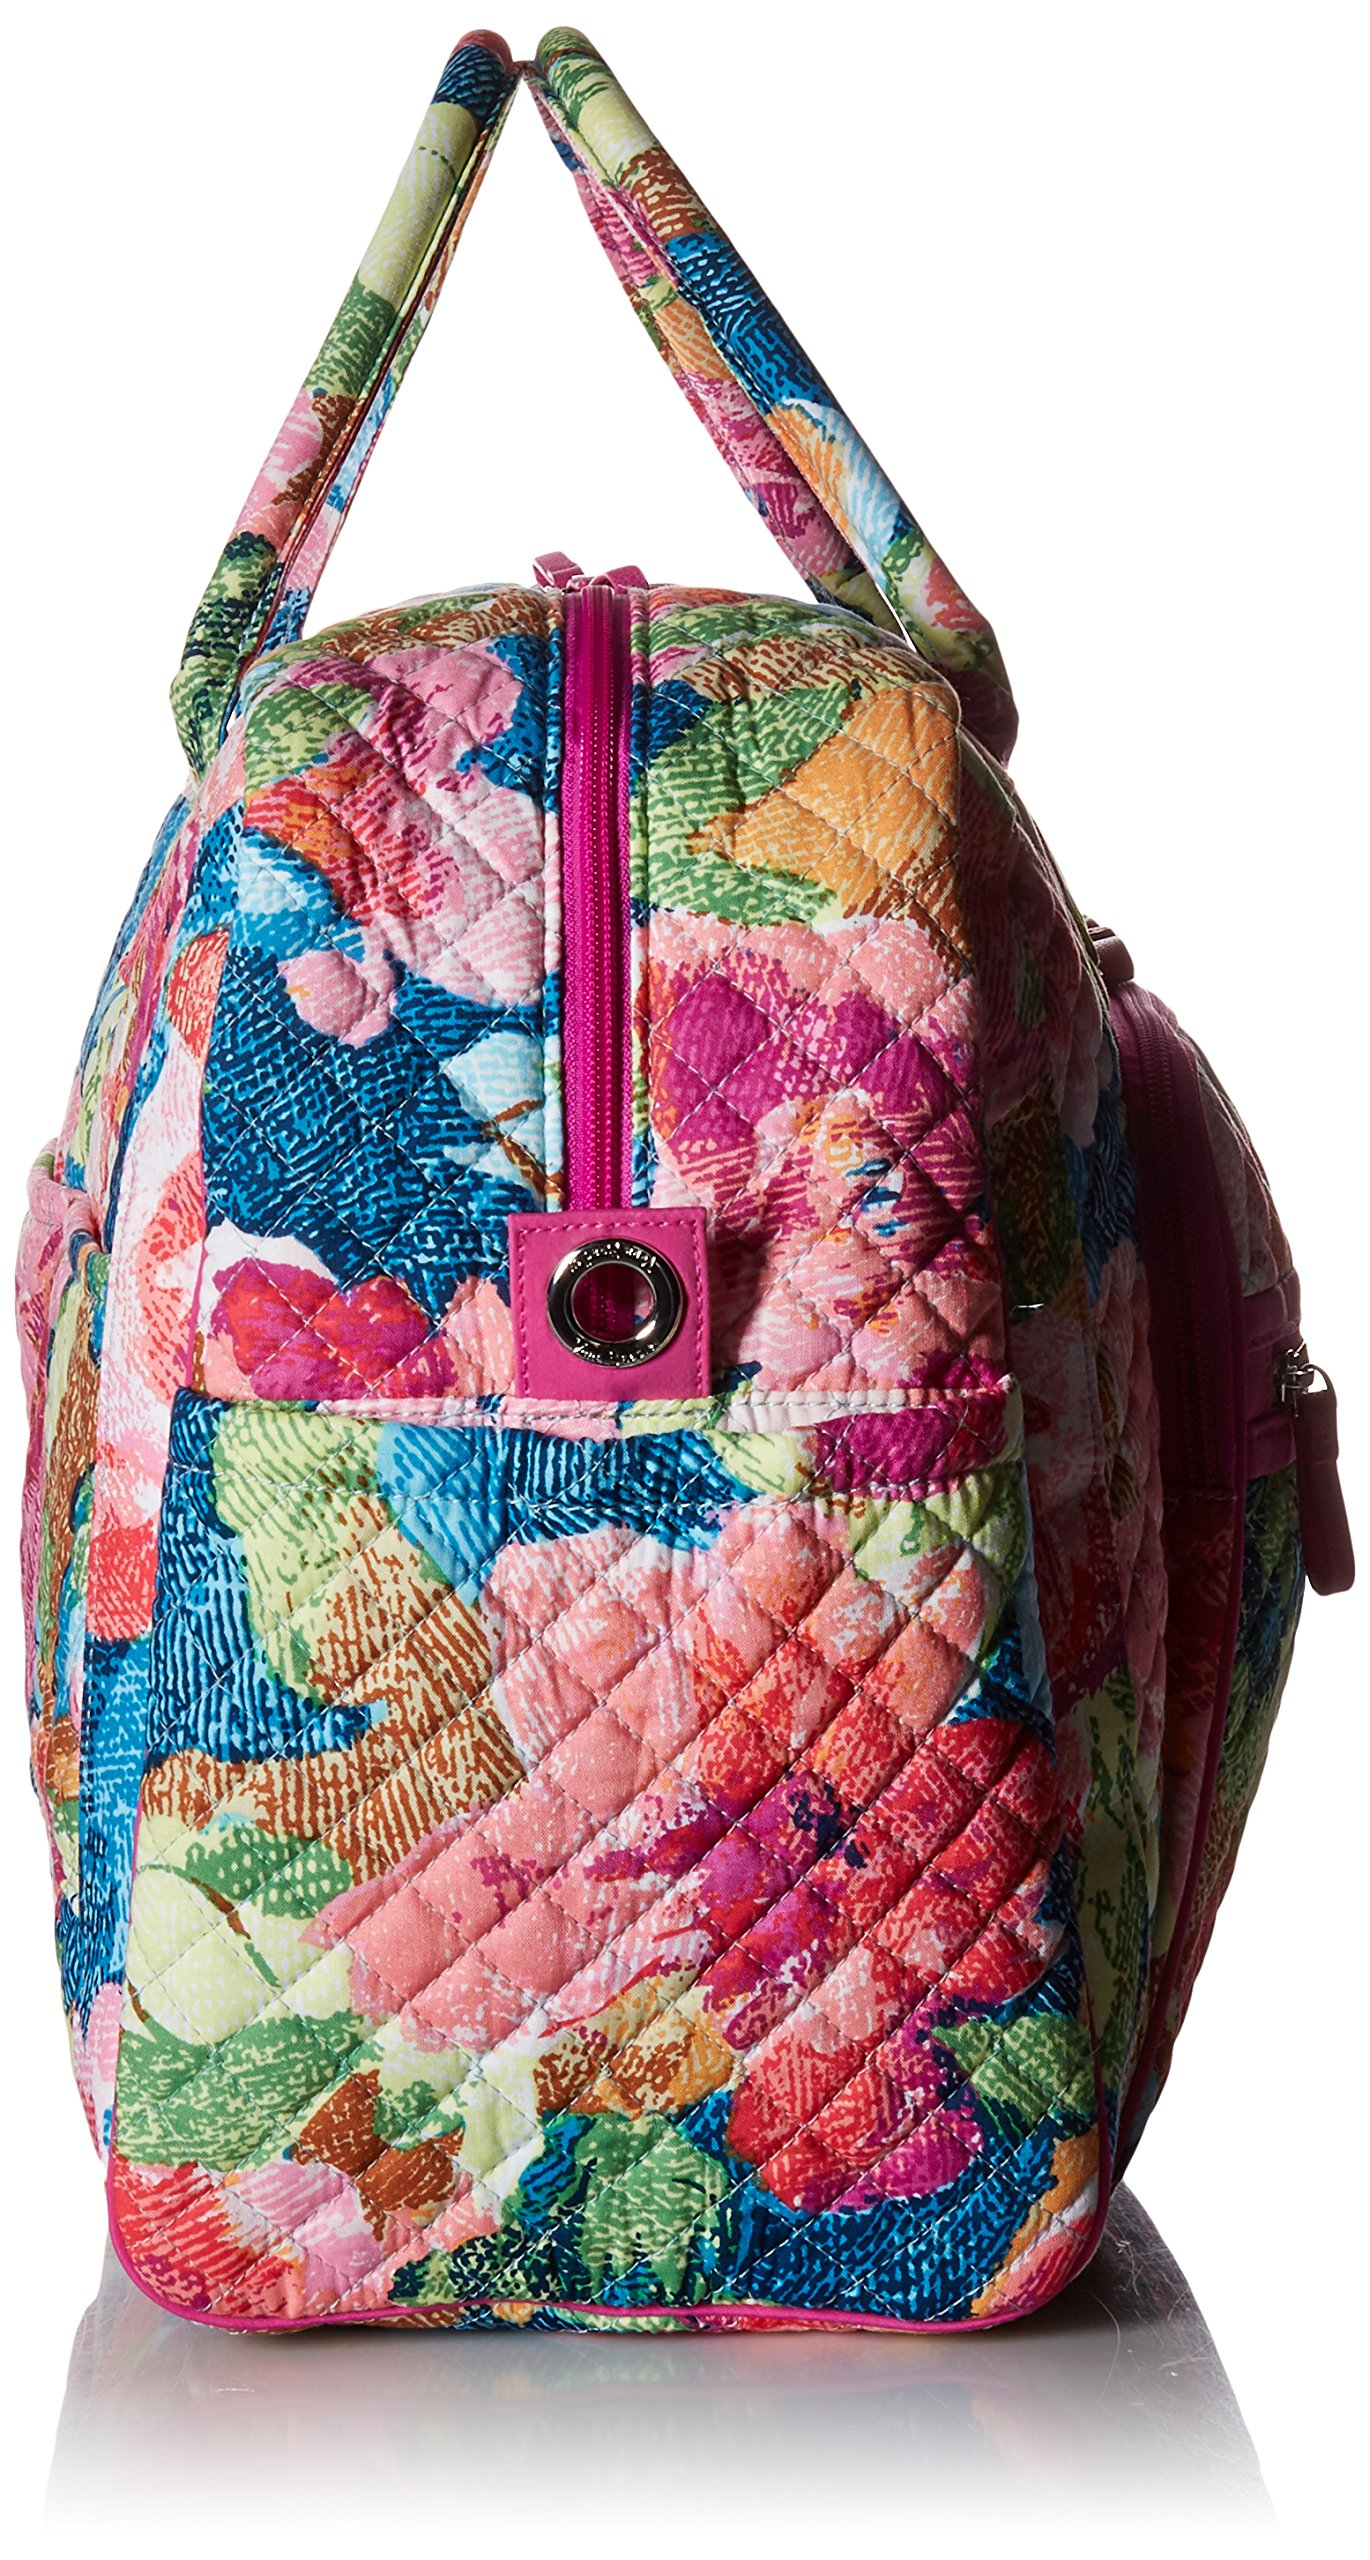 Vera Bradley Iconic Weekender Travel Bag, Signature Cotton, Superbloom by Vera Bradley (Image #4)